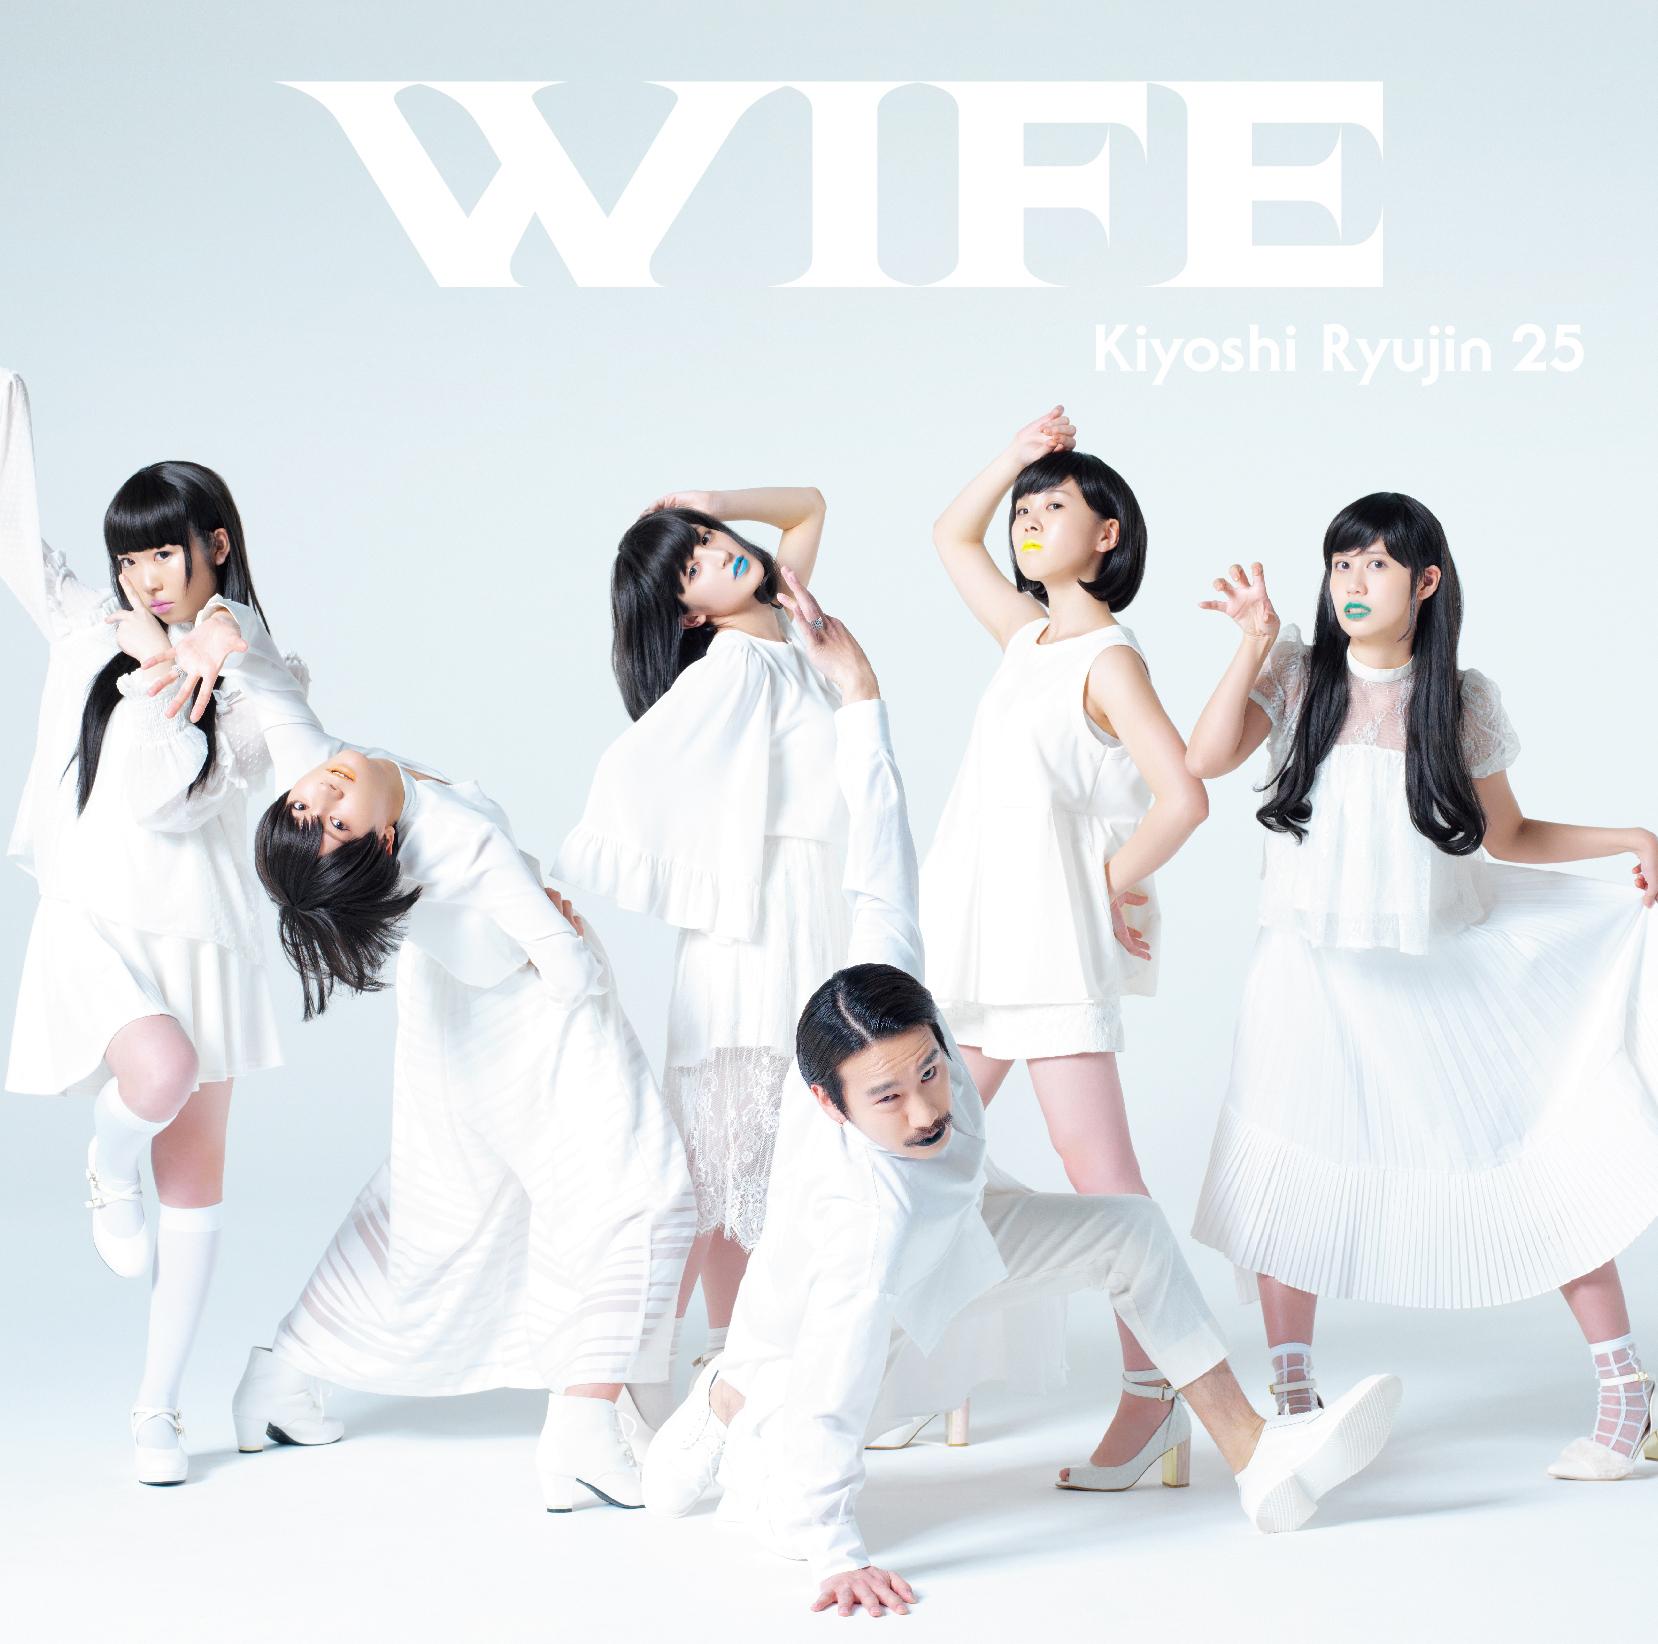 20170518.1644.05 Kiyoshi Ryujin 25 - Wife (FLAC) cover.jpg